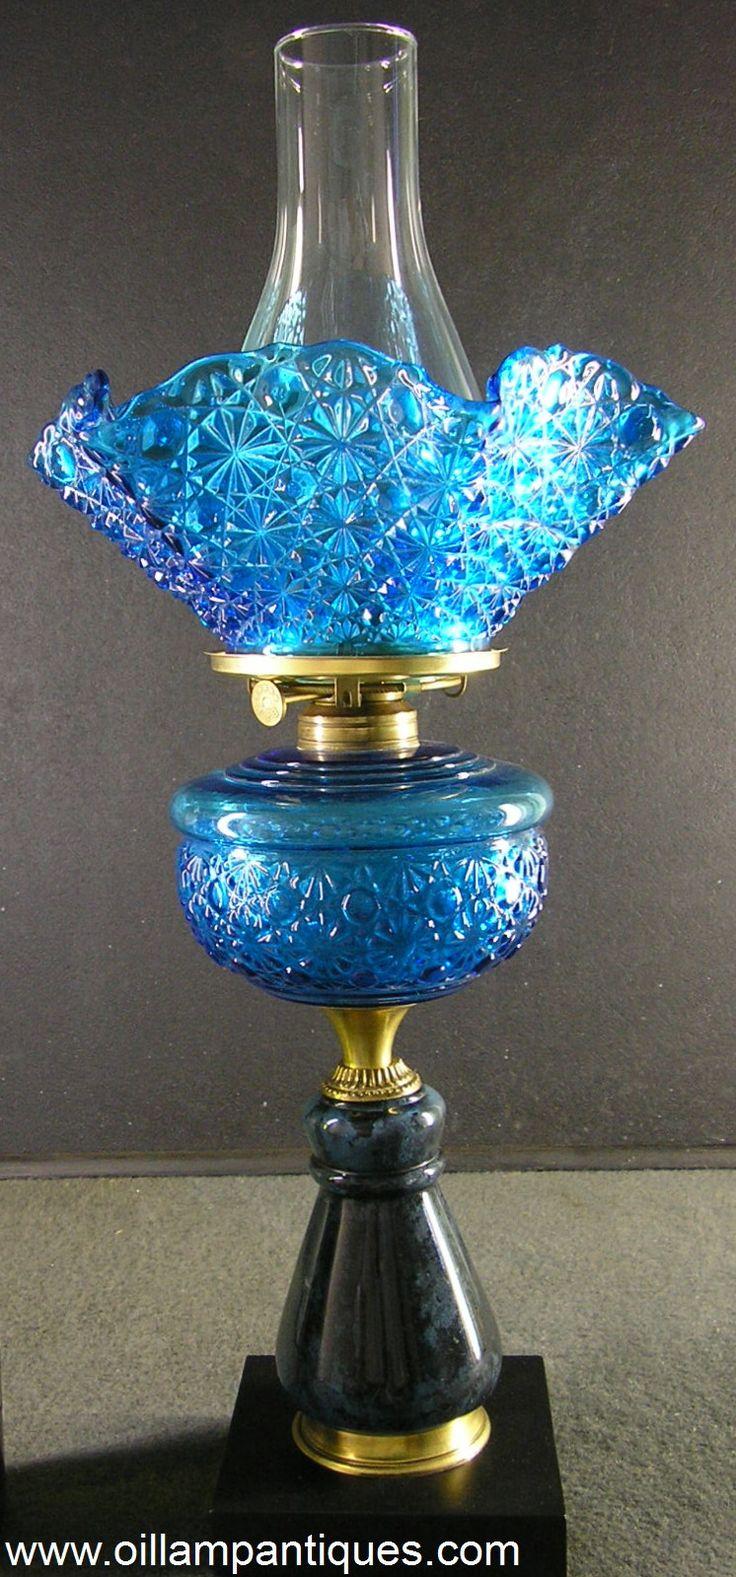 """Daisy Button"" Composite Oil Lamp Kerosene Lamp | Oil Lamp Antiques"